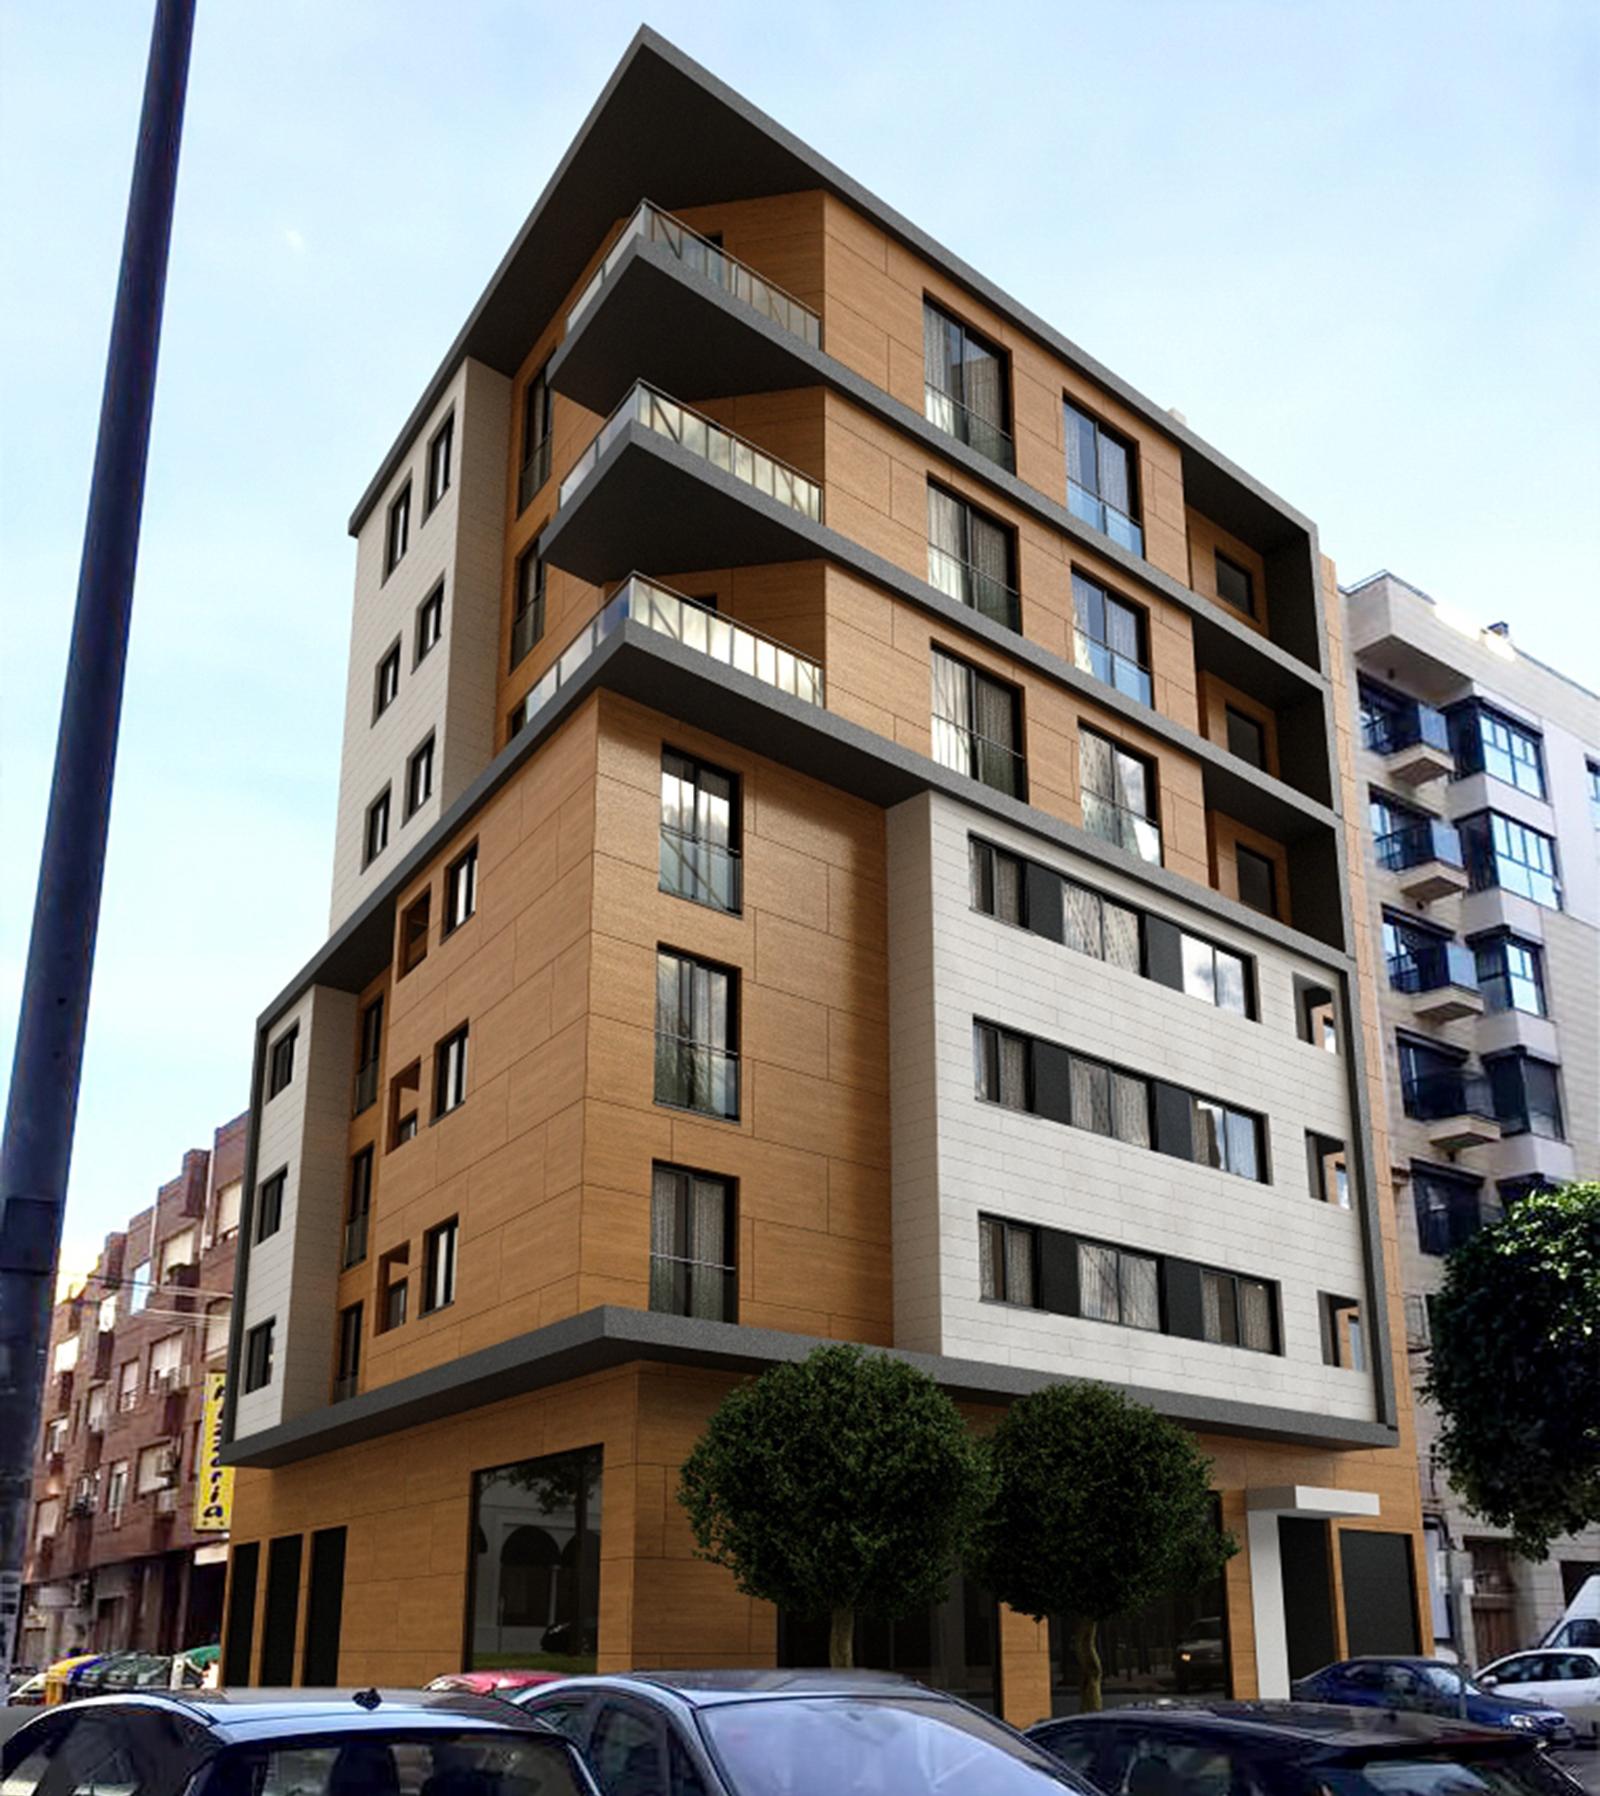 Proyectos lumarquitec estudio de arquitectura cartagena - Arquitectos en murcia ...